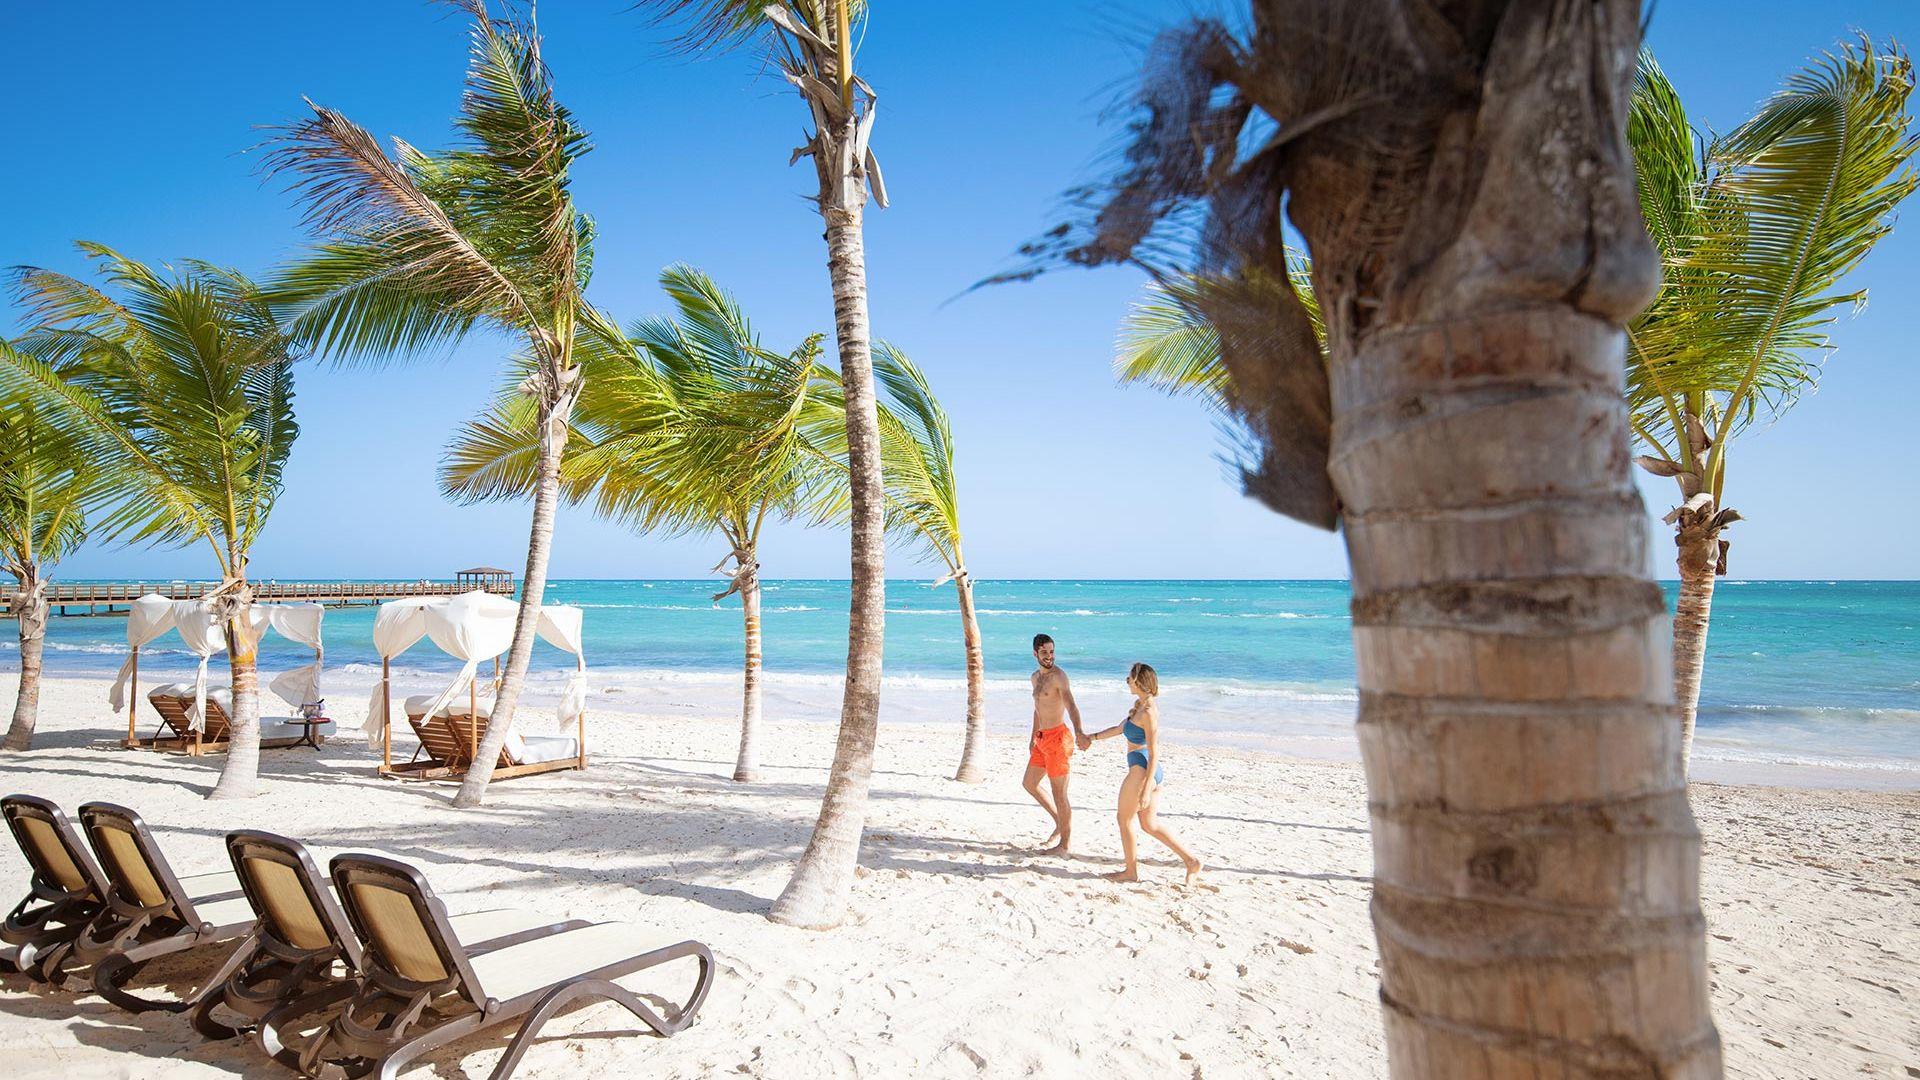 Sejur charter Punta Cana, 9 zile - februarie 2022